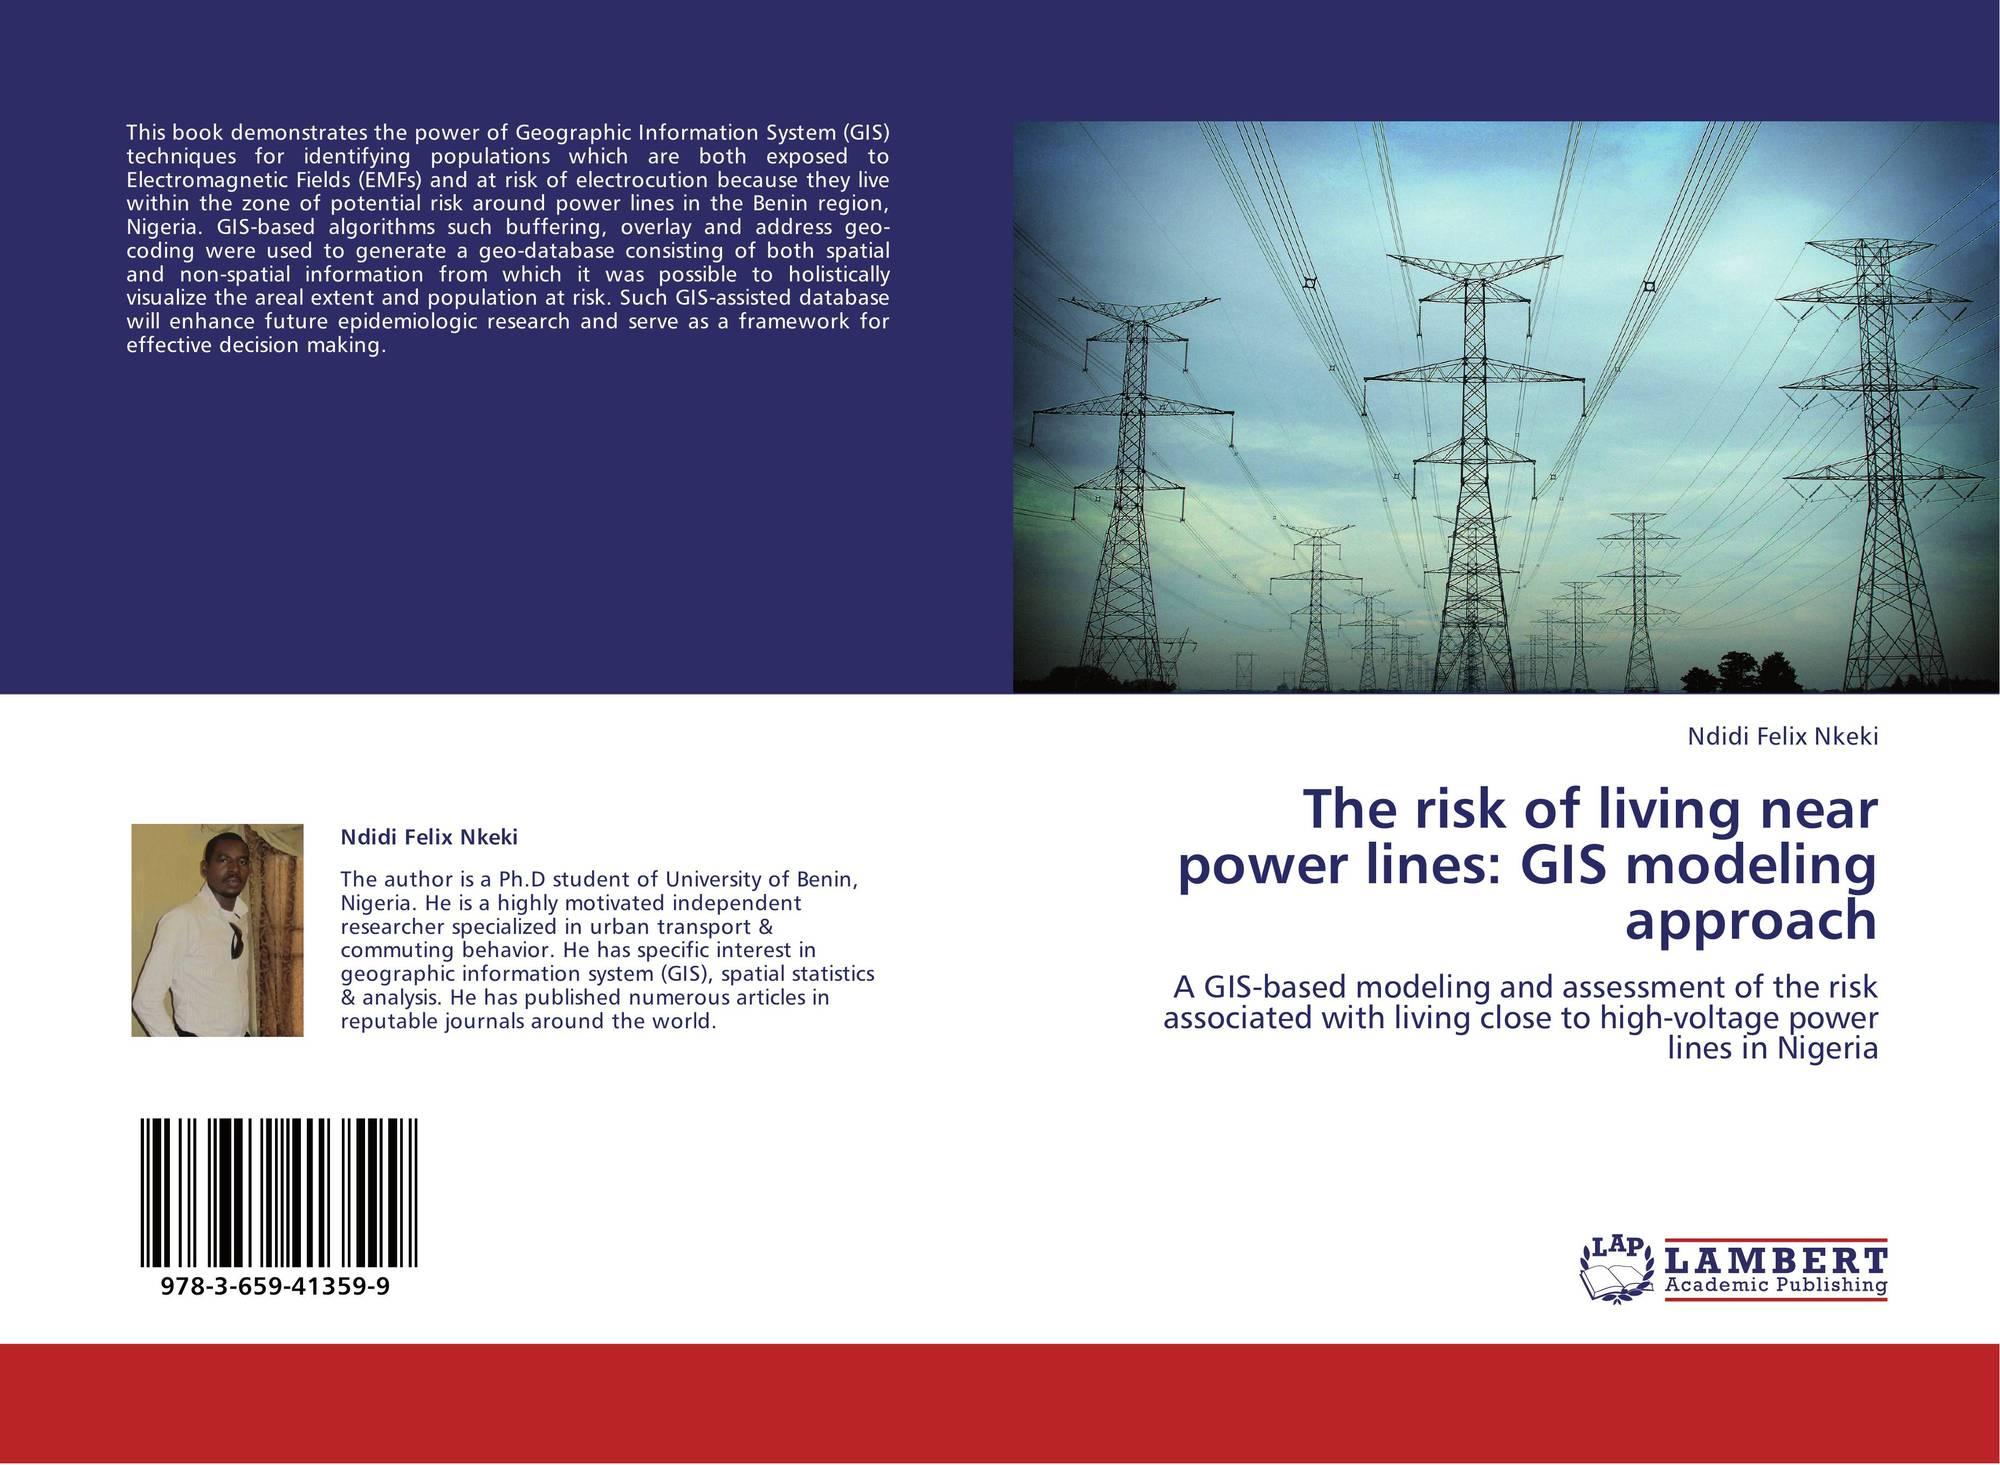 The Risk Of Living Near Power Lines Gis Modeling Approach 978 3 659 41359 9 3659413593 9783659413599 By Ndidi Felix Nkeki